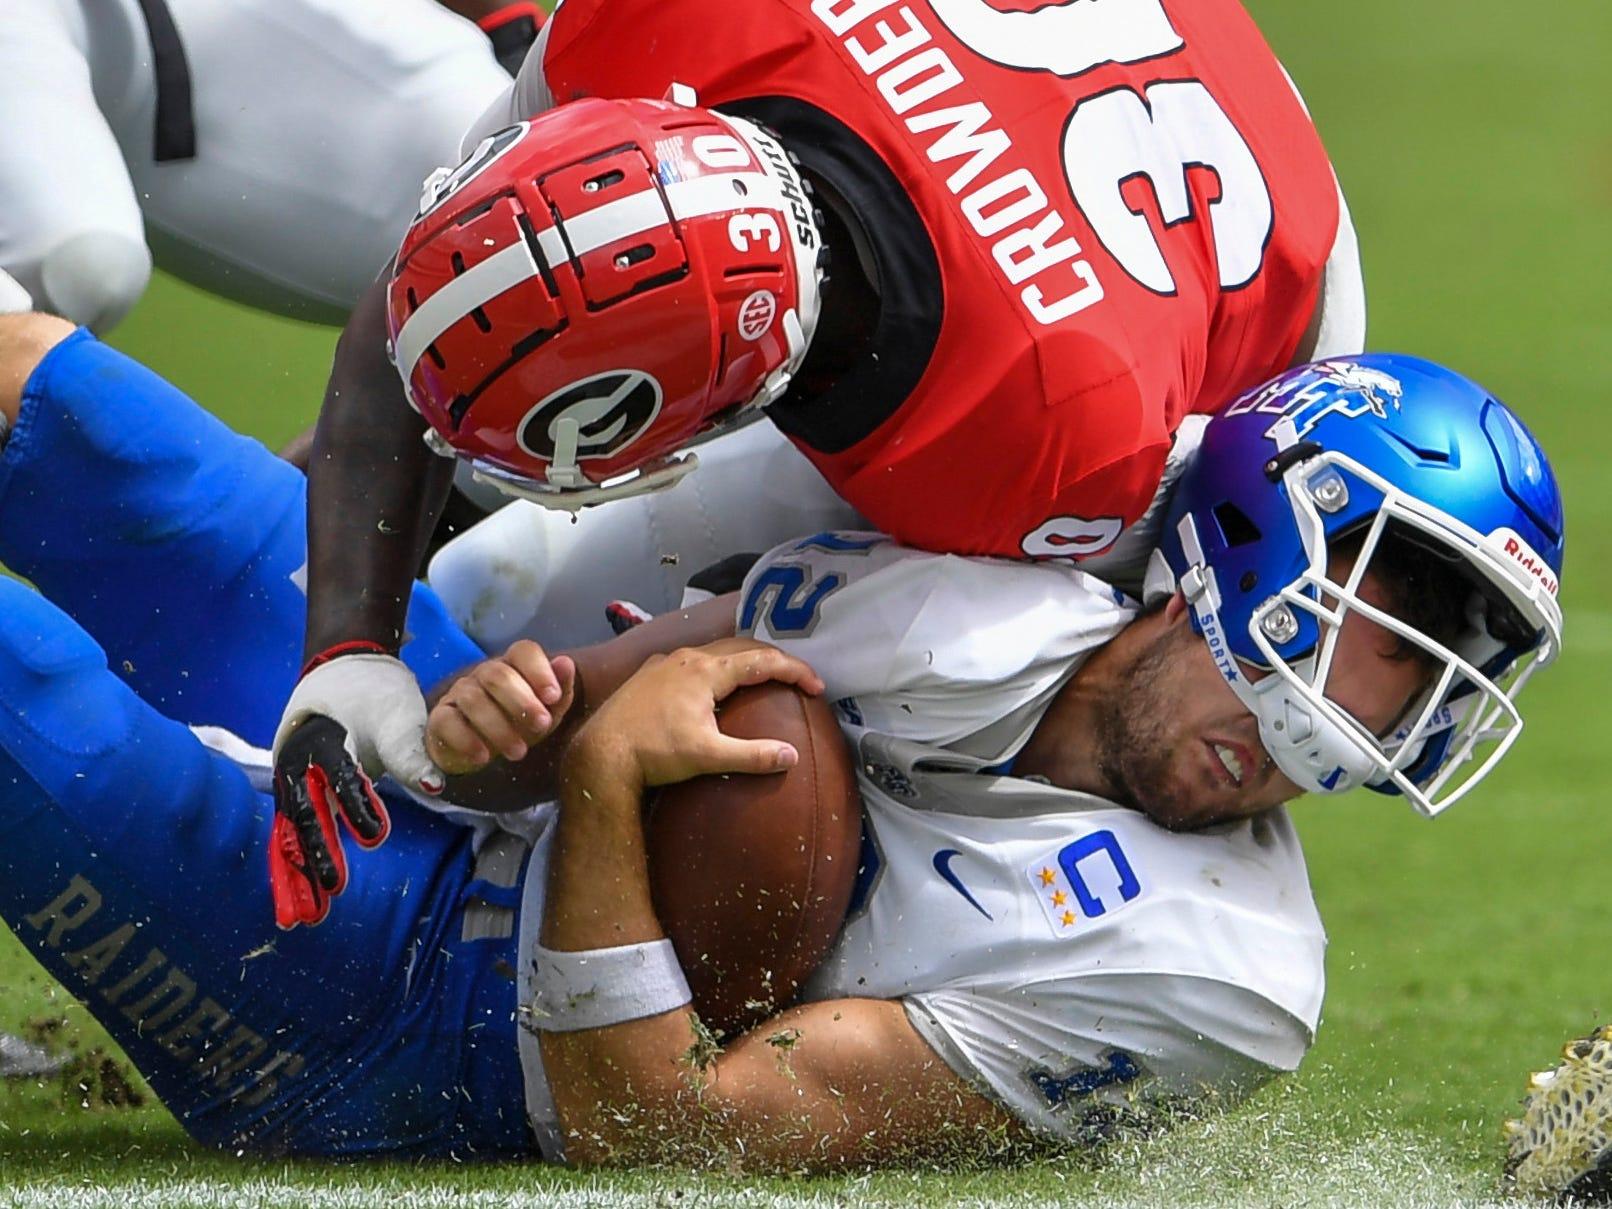 Georgia Bulldogs linebacker Tae Crowder (30) tackles Middle Tennessee Blue Raiders quarterback Brent Stockstill (12) during the second half at Sanford Stadium.